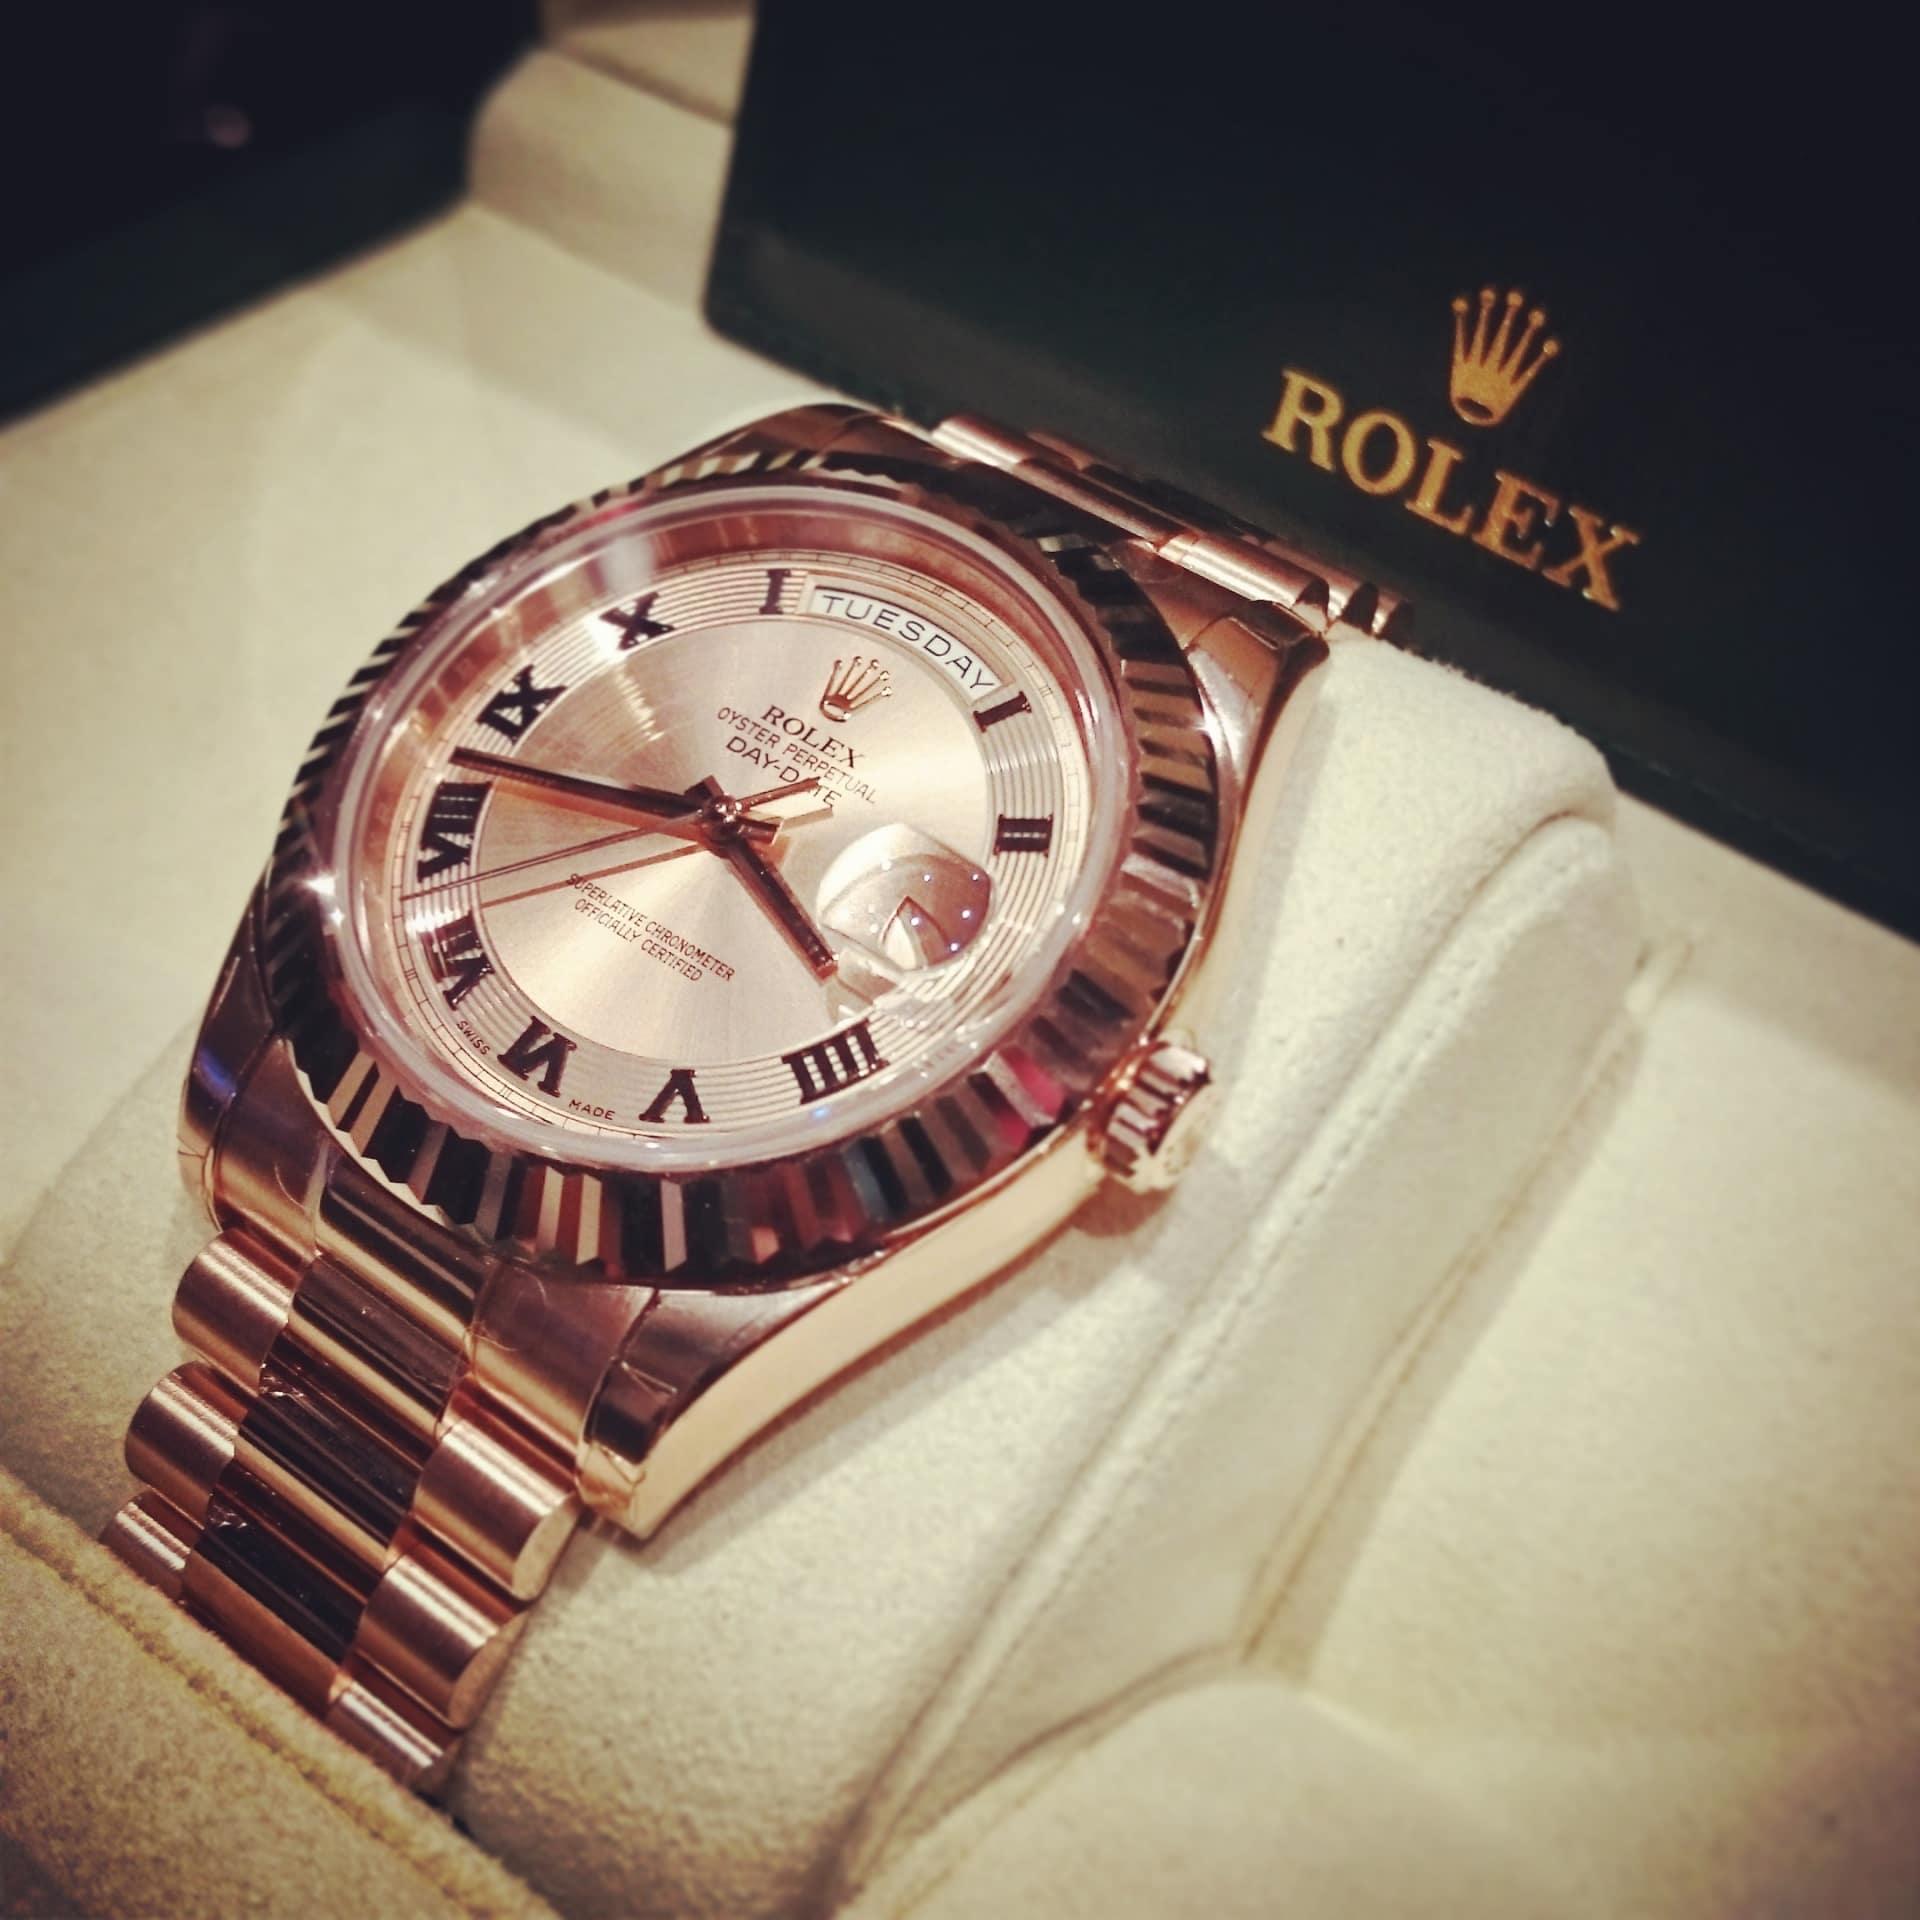 Rolex, le luxe intemporel